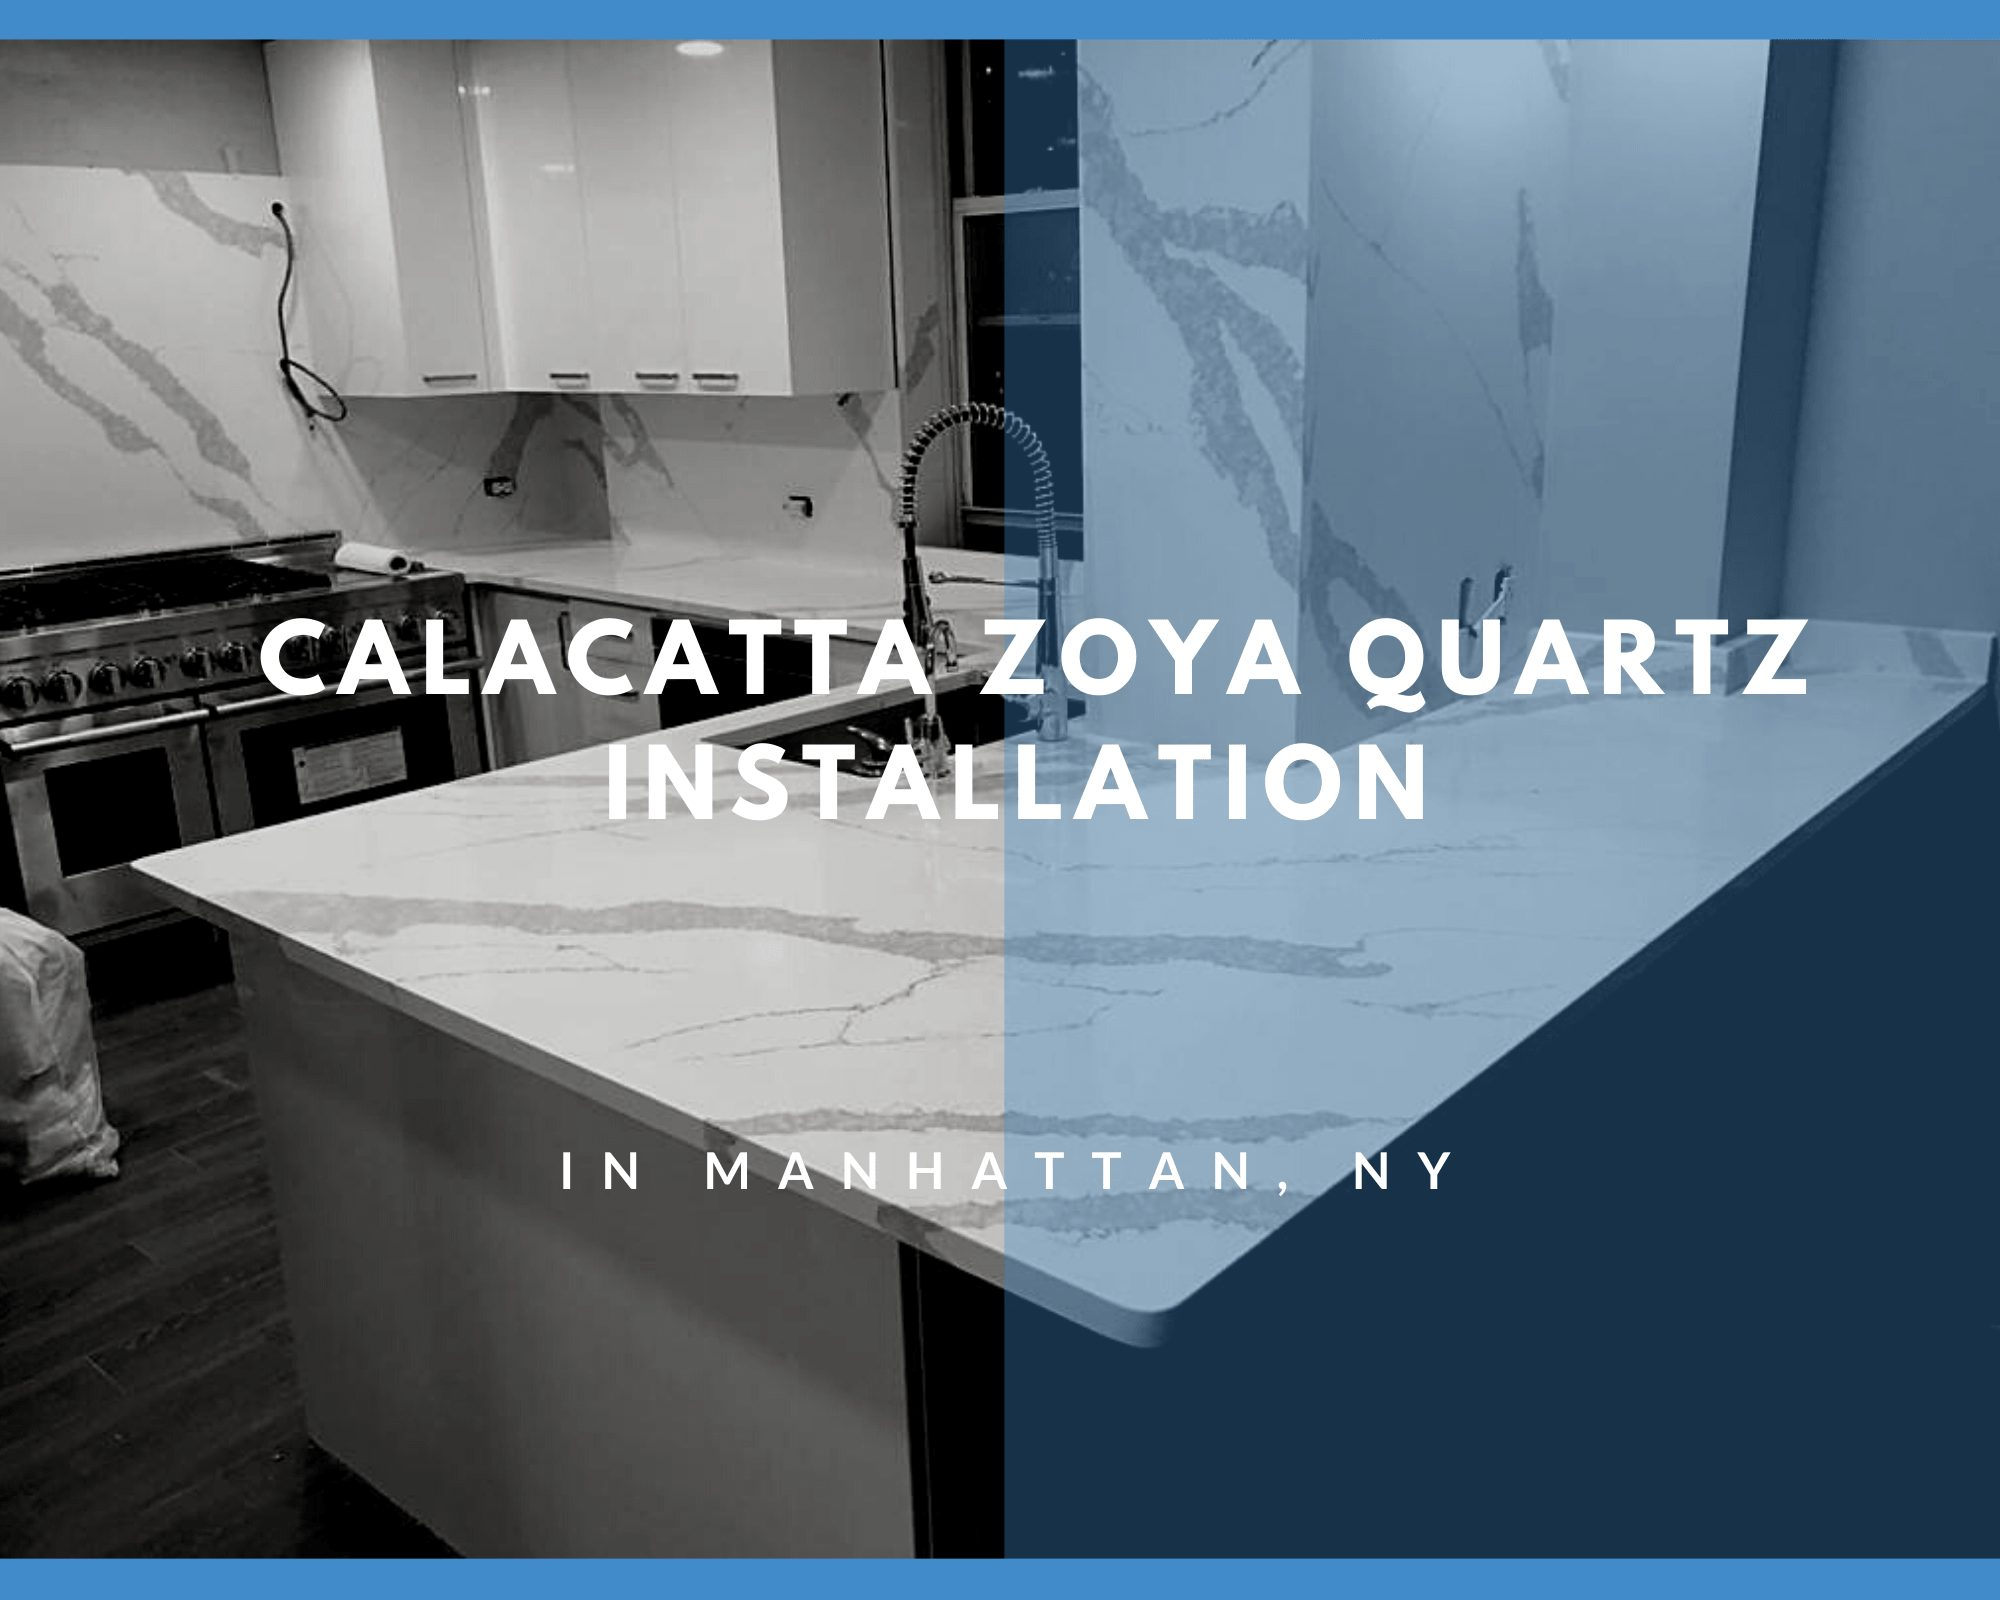 Calacatta Zoya Quartz Installation in Manhattan, NY